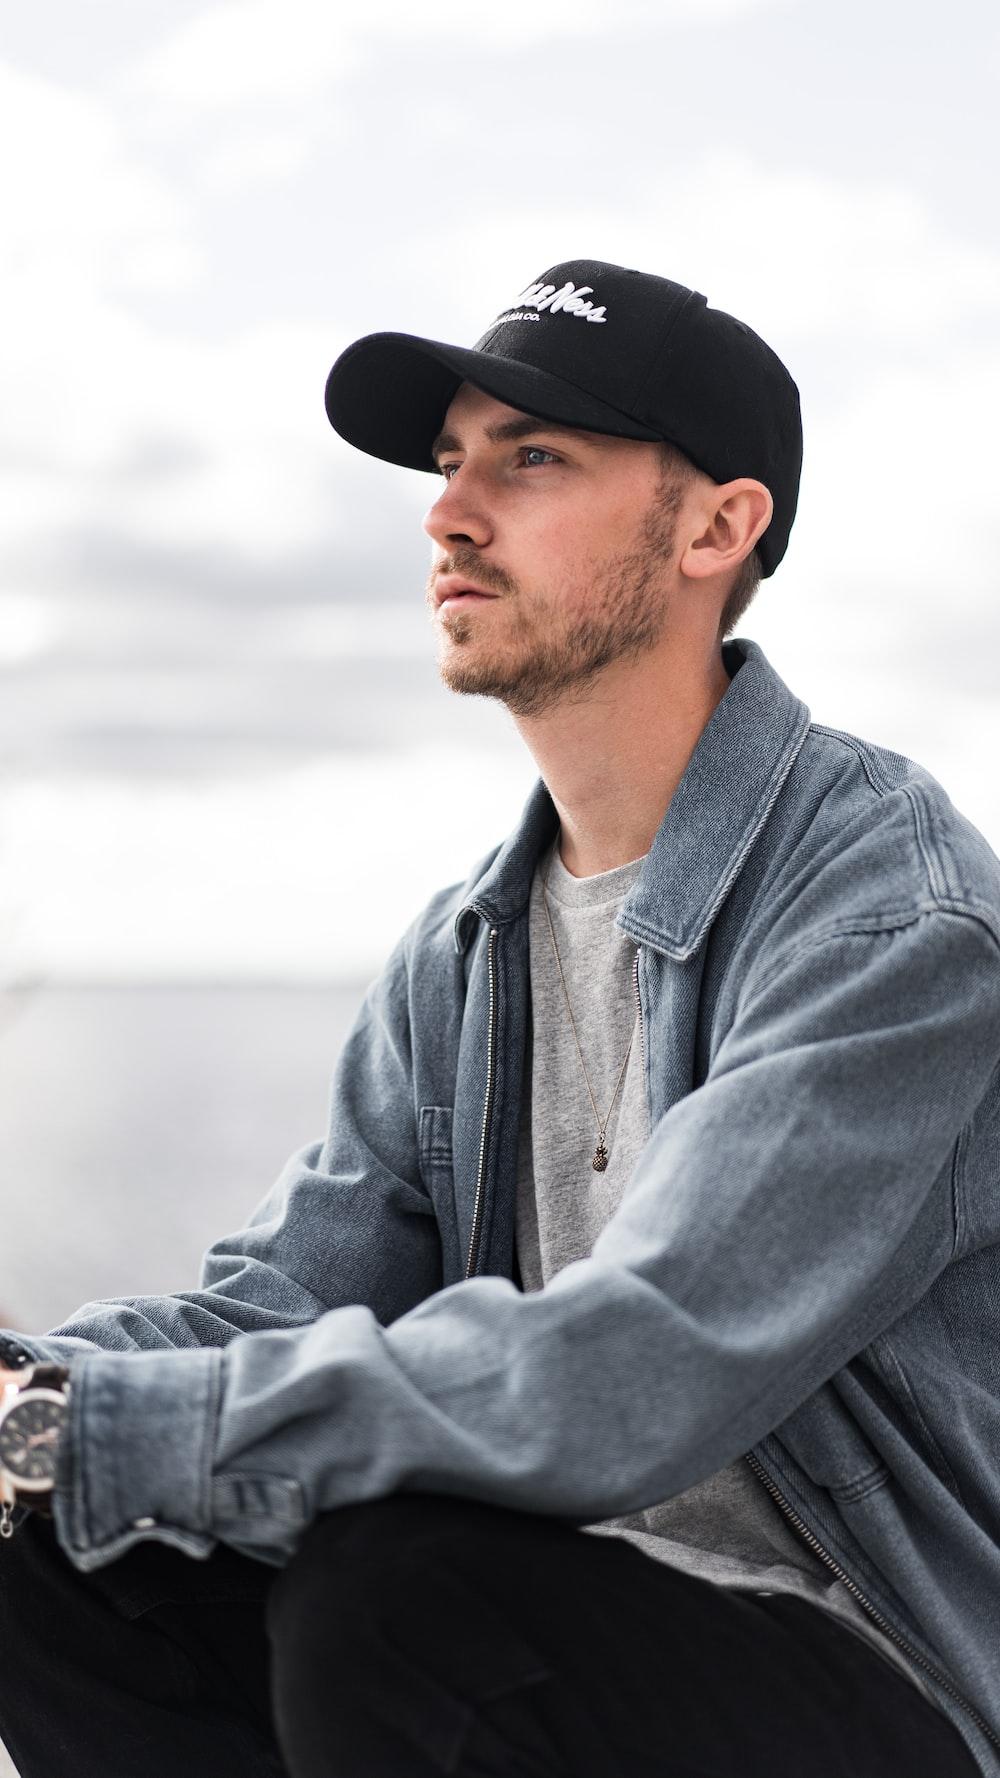 man in gray zip up jacket and black cap